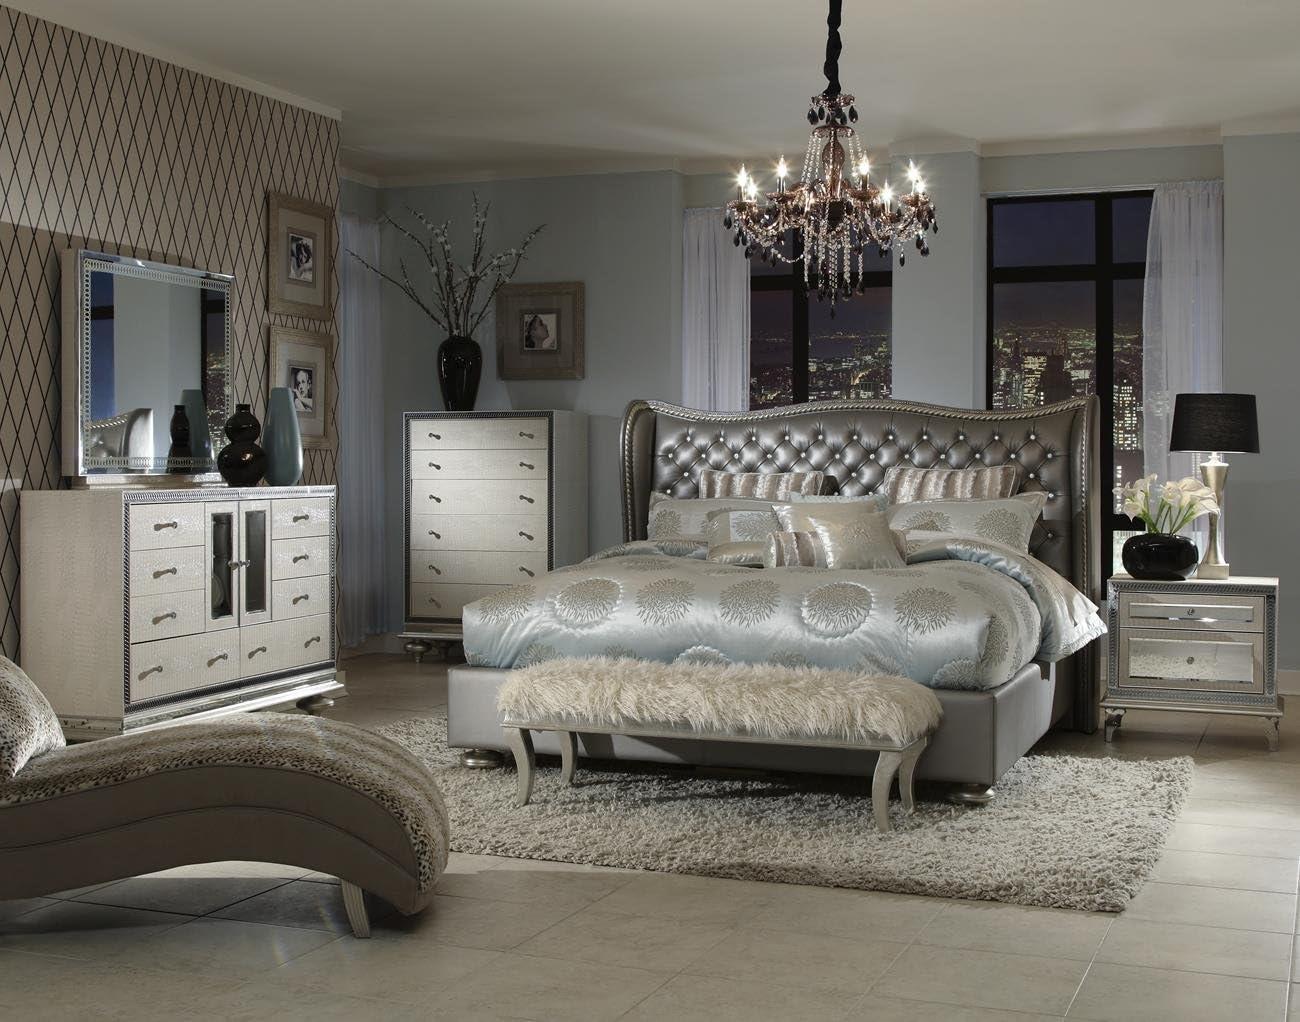 Amazon Com Hollywood Swank Queen Graphite 4 Piece Bedroom Set By Aico Amini Furniture Decor